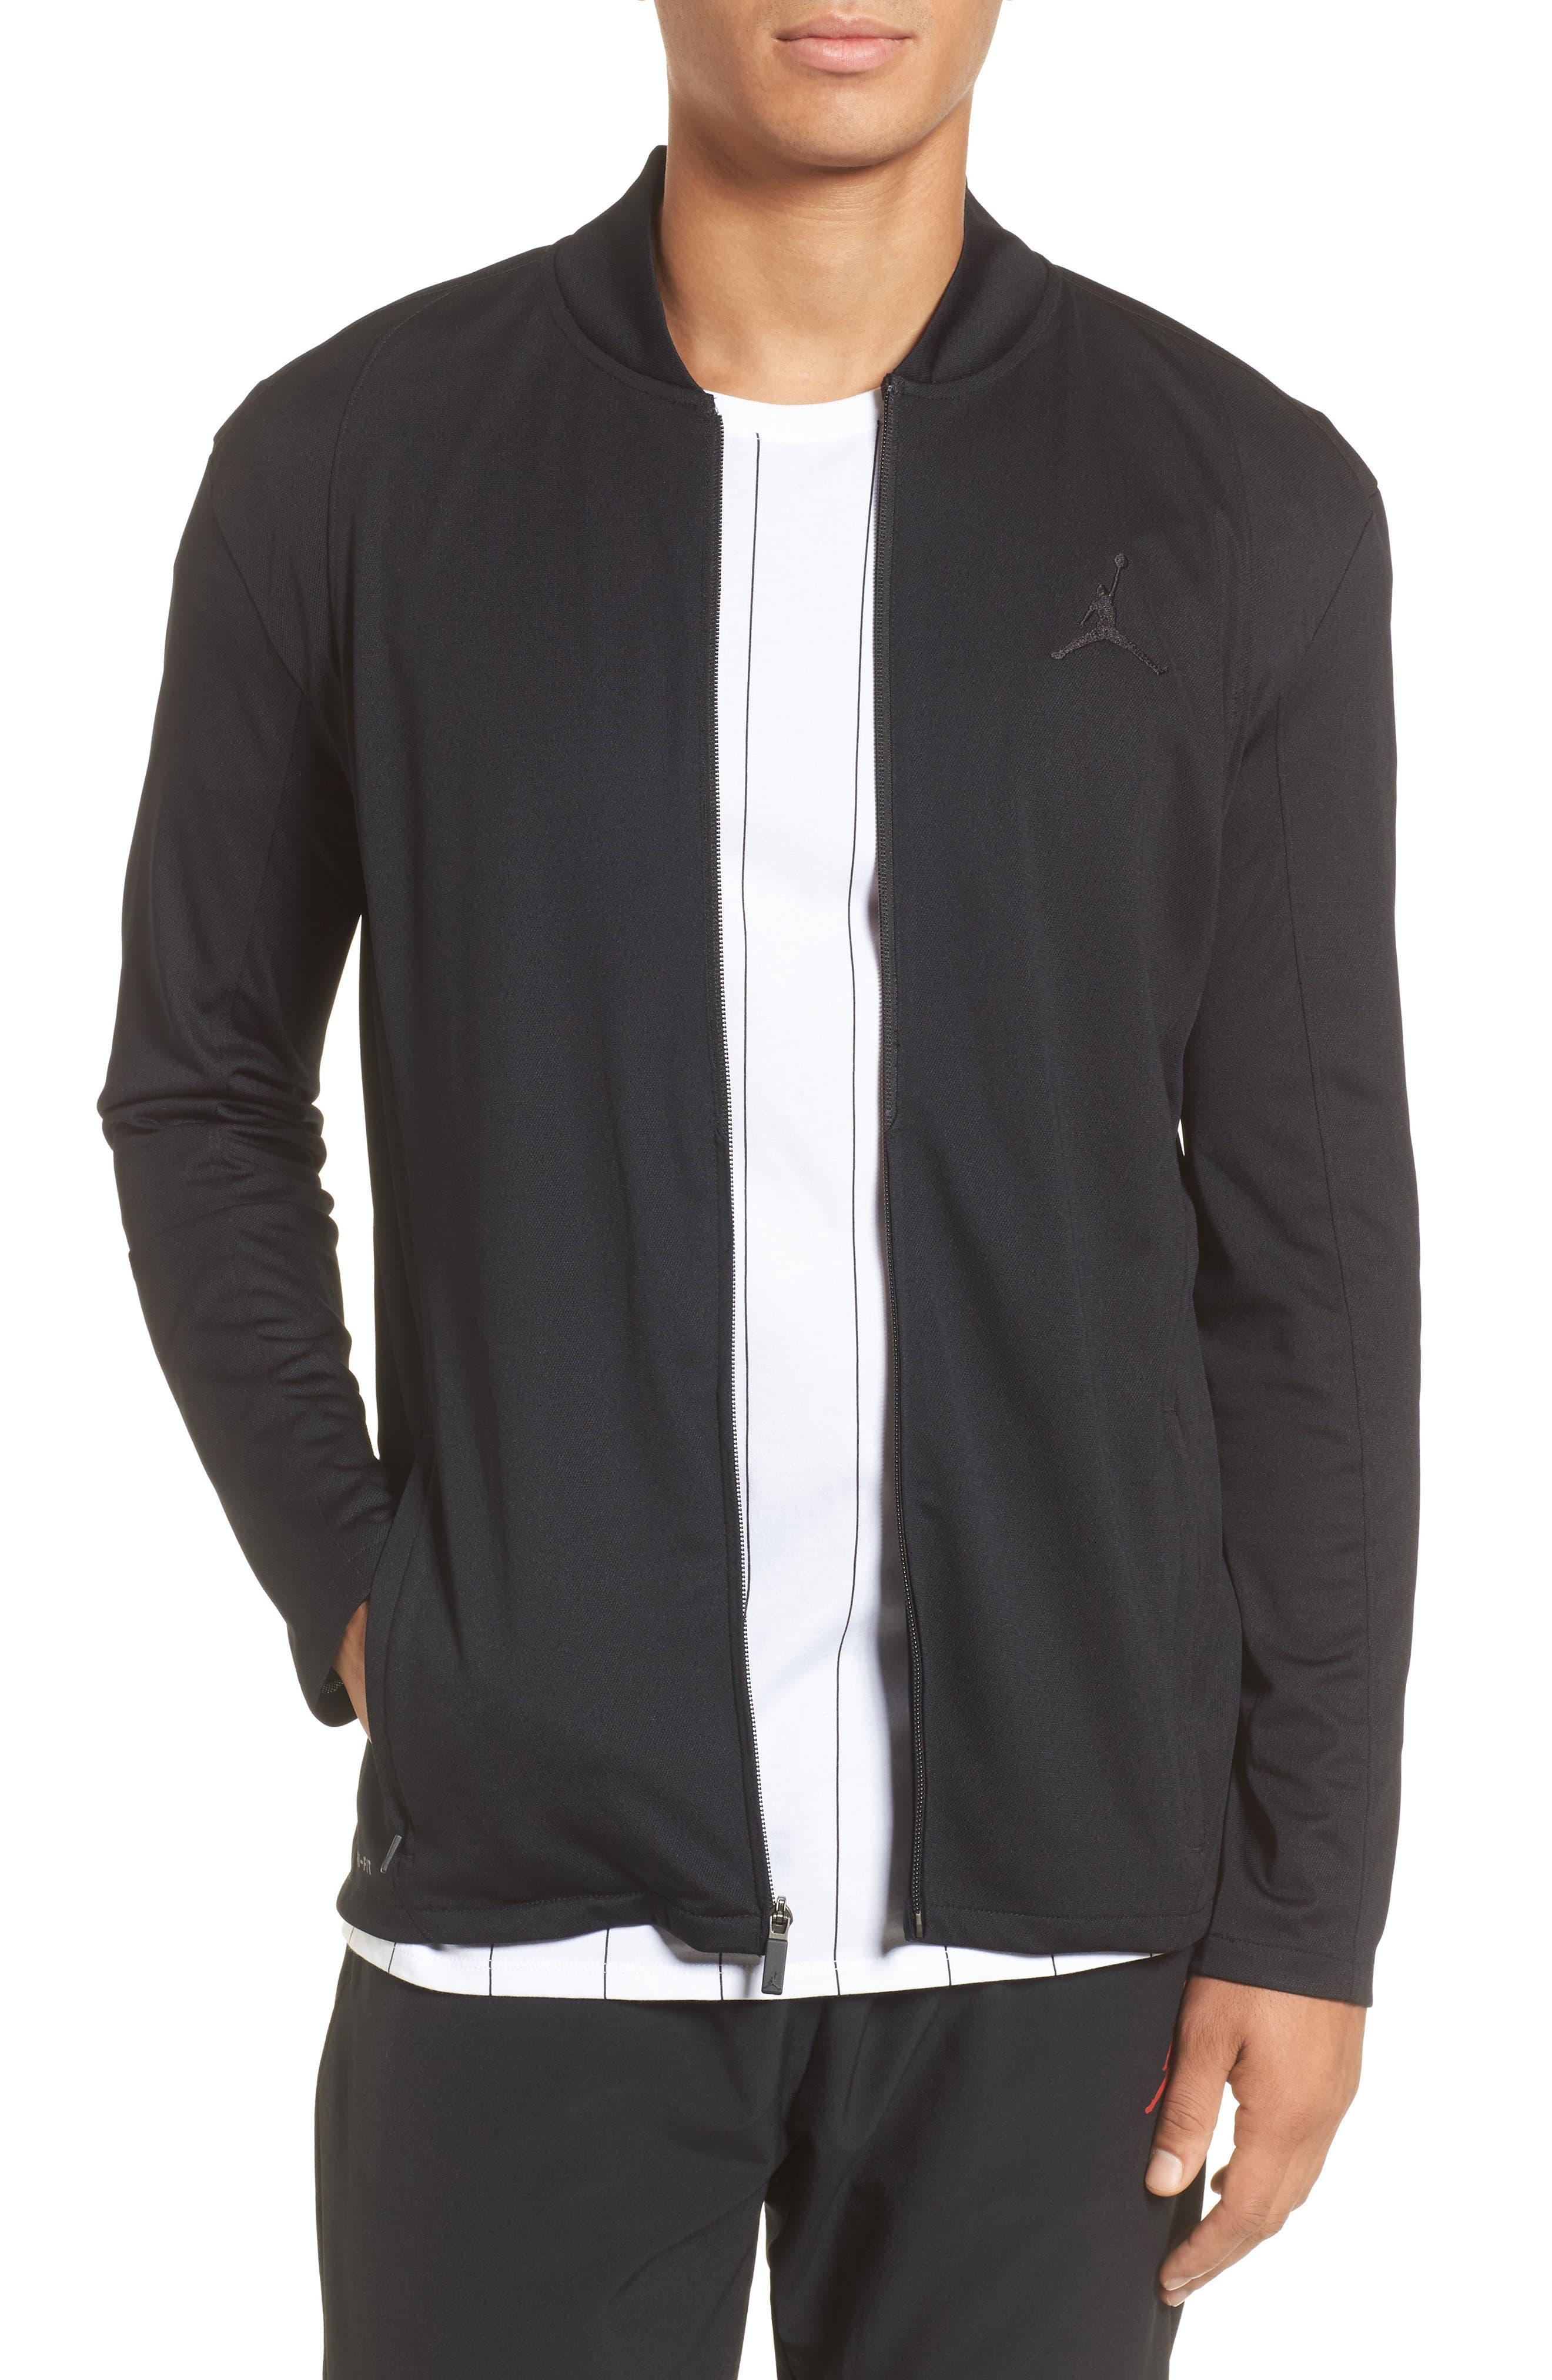 Ultimate Flight Zip Jacket,                             Main thumbnail 1, color,                             Black/ Black